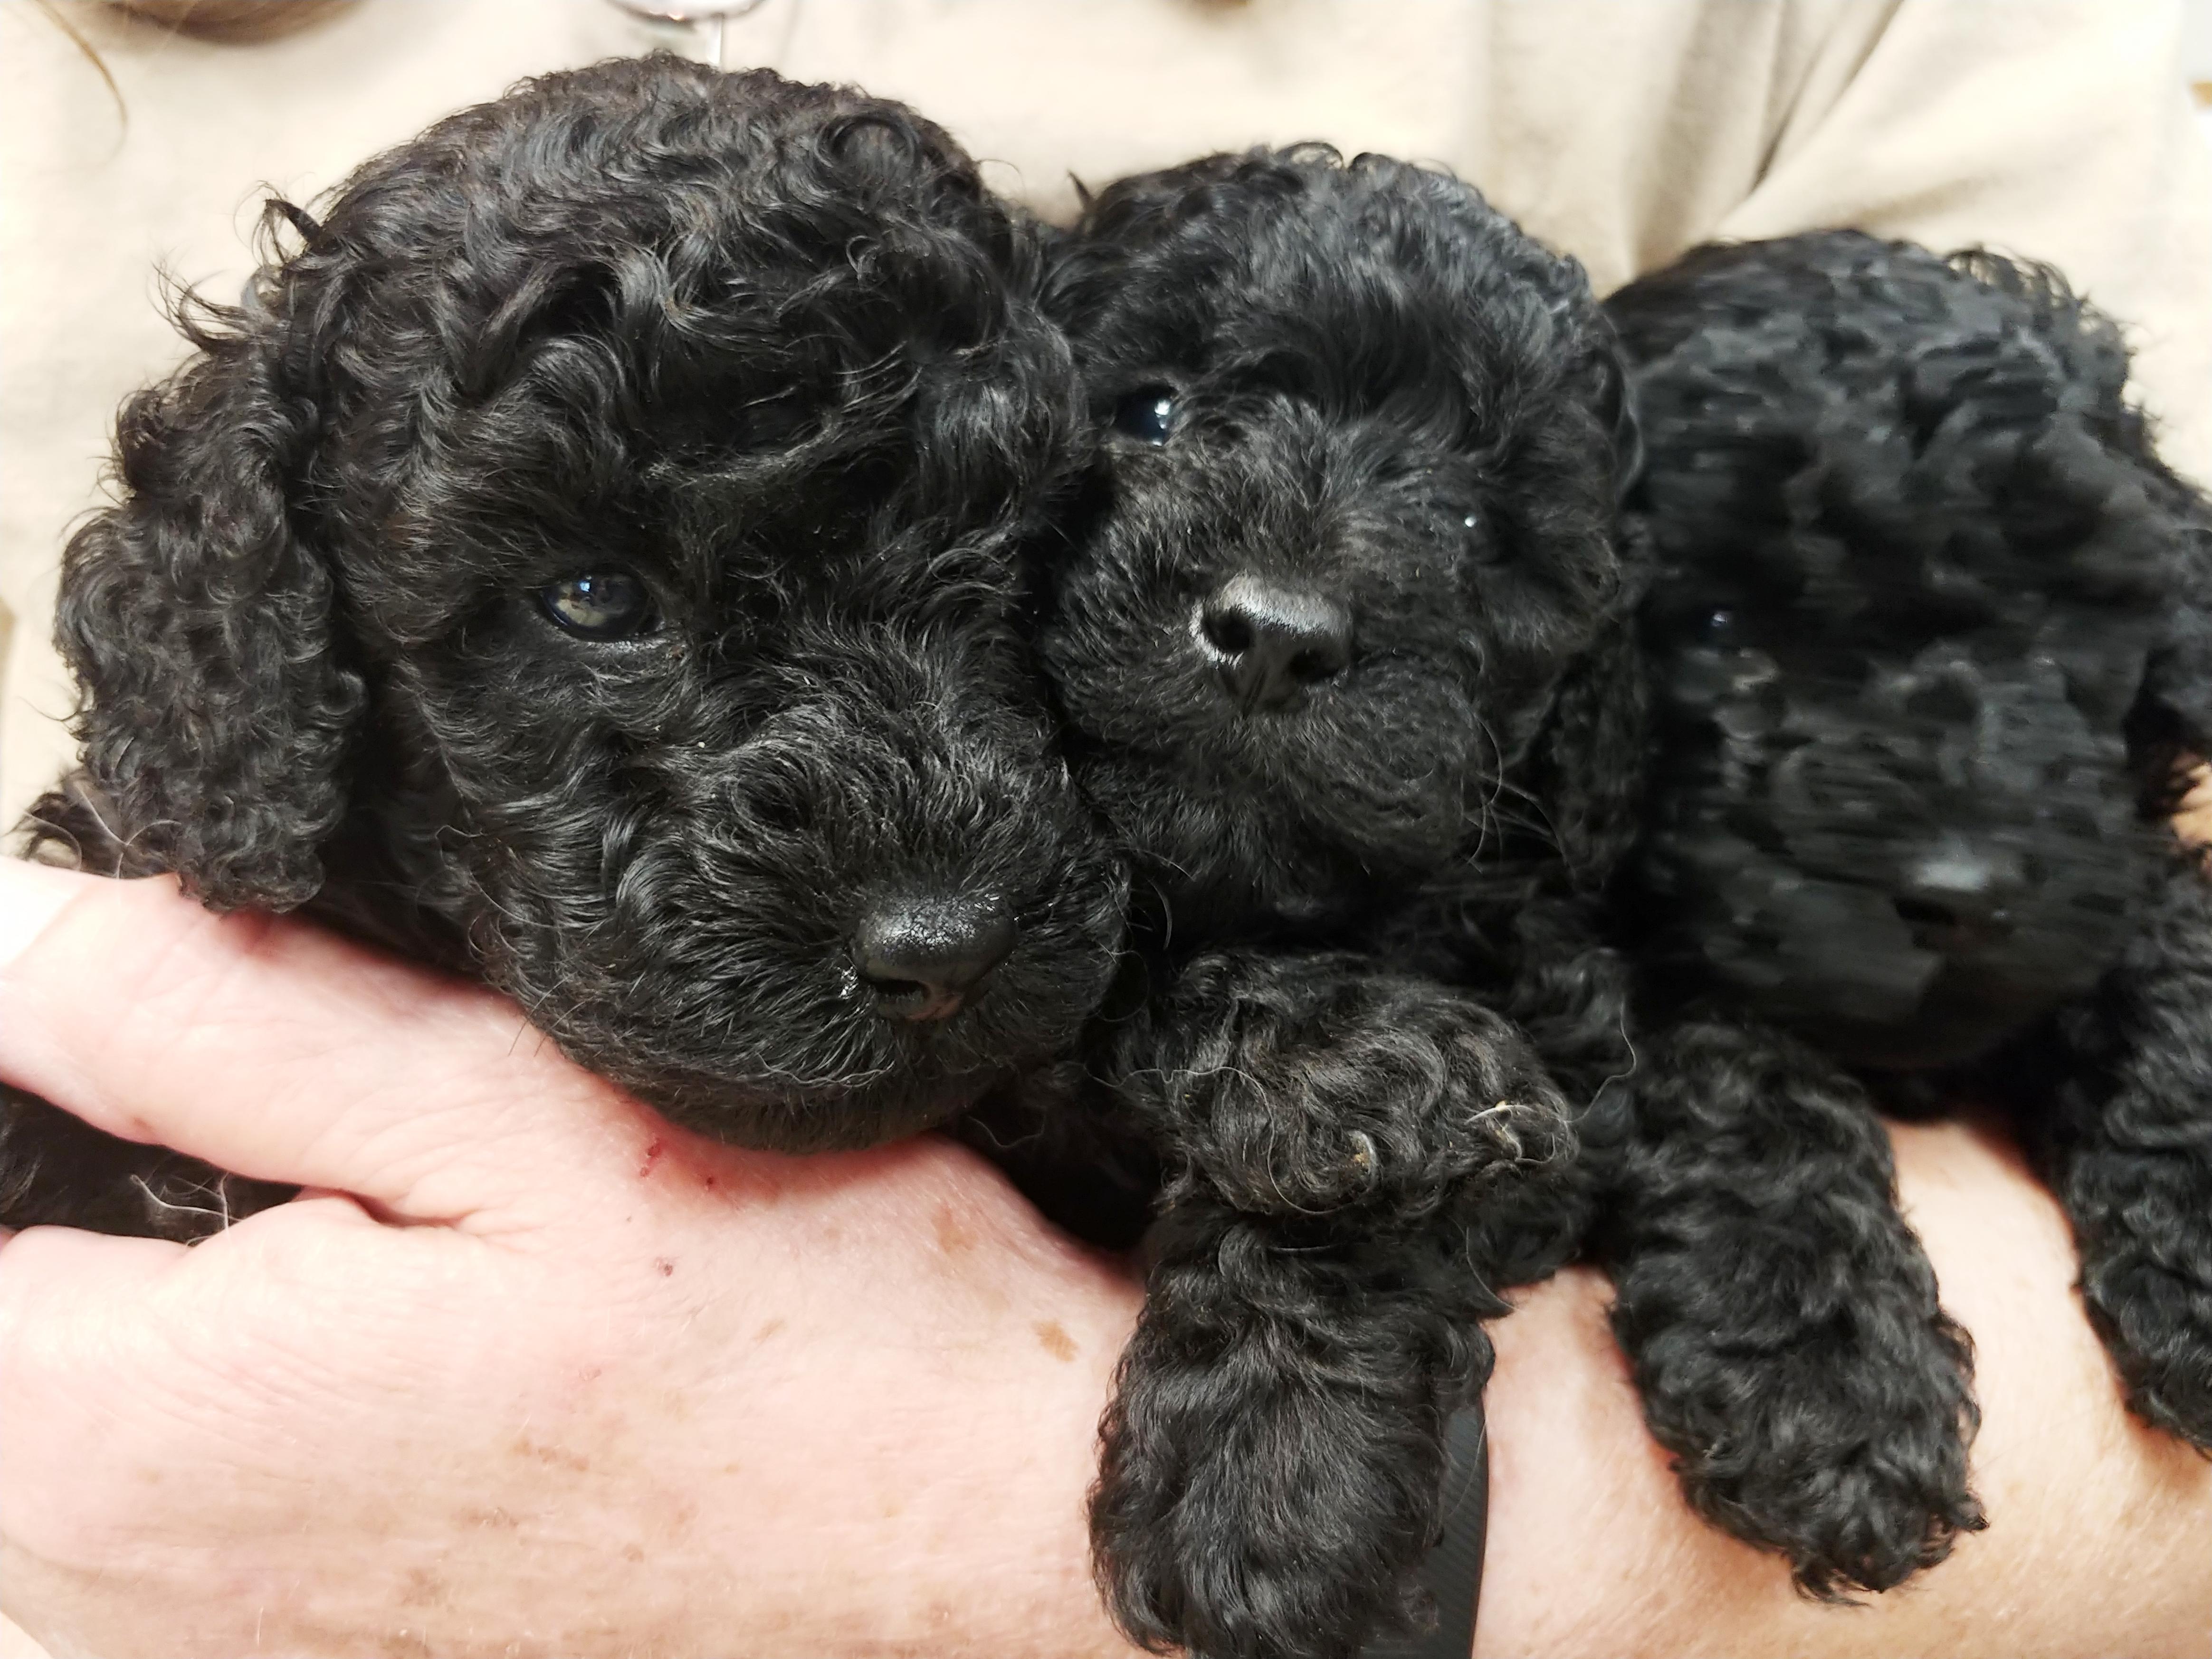 Black Poodle Puppies Impressive Kennels